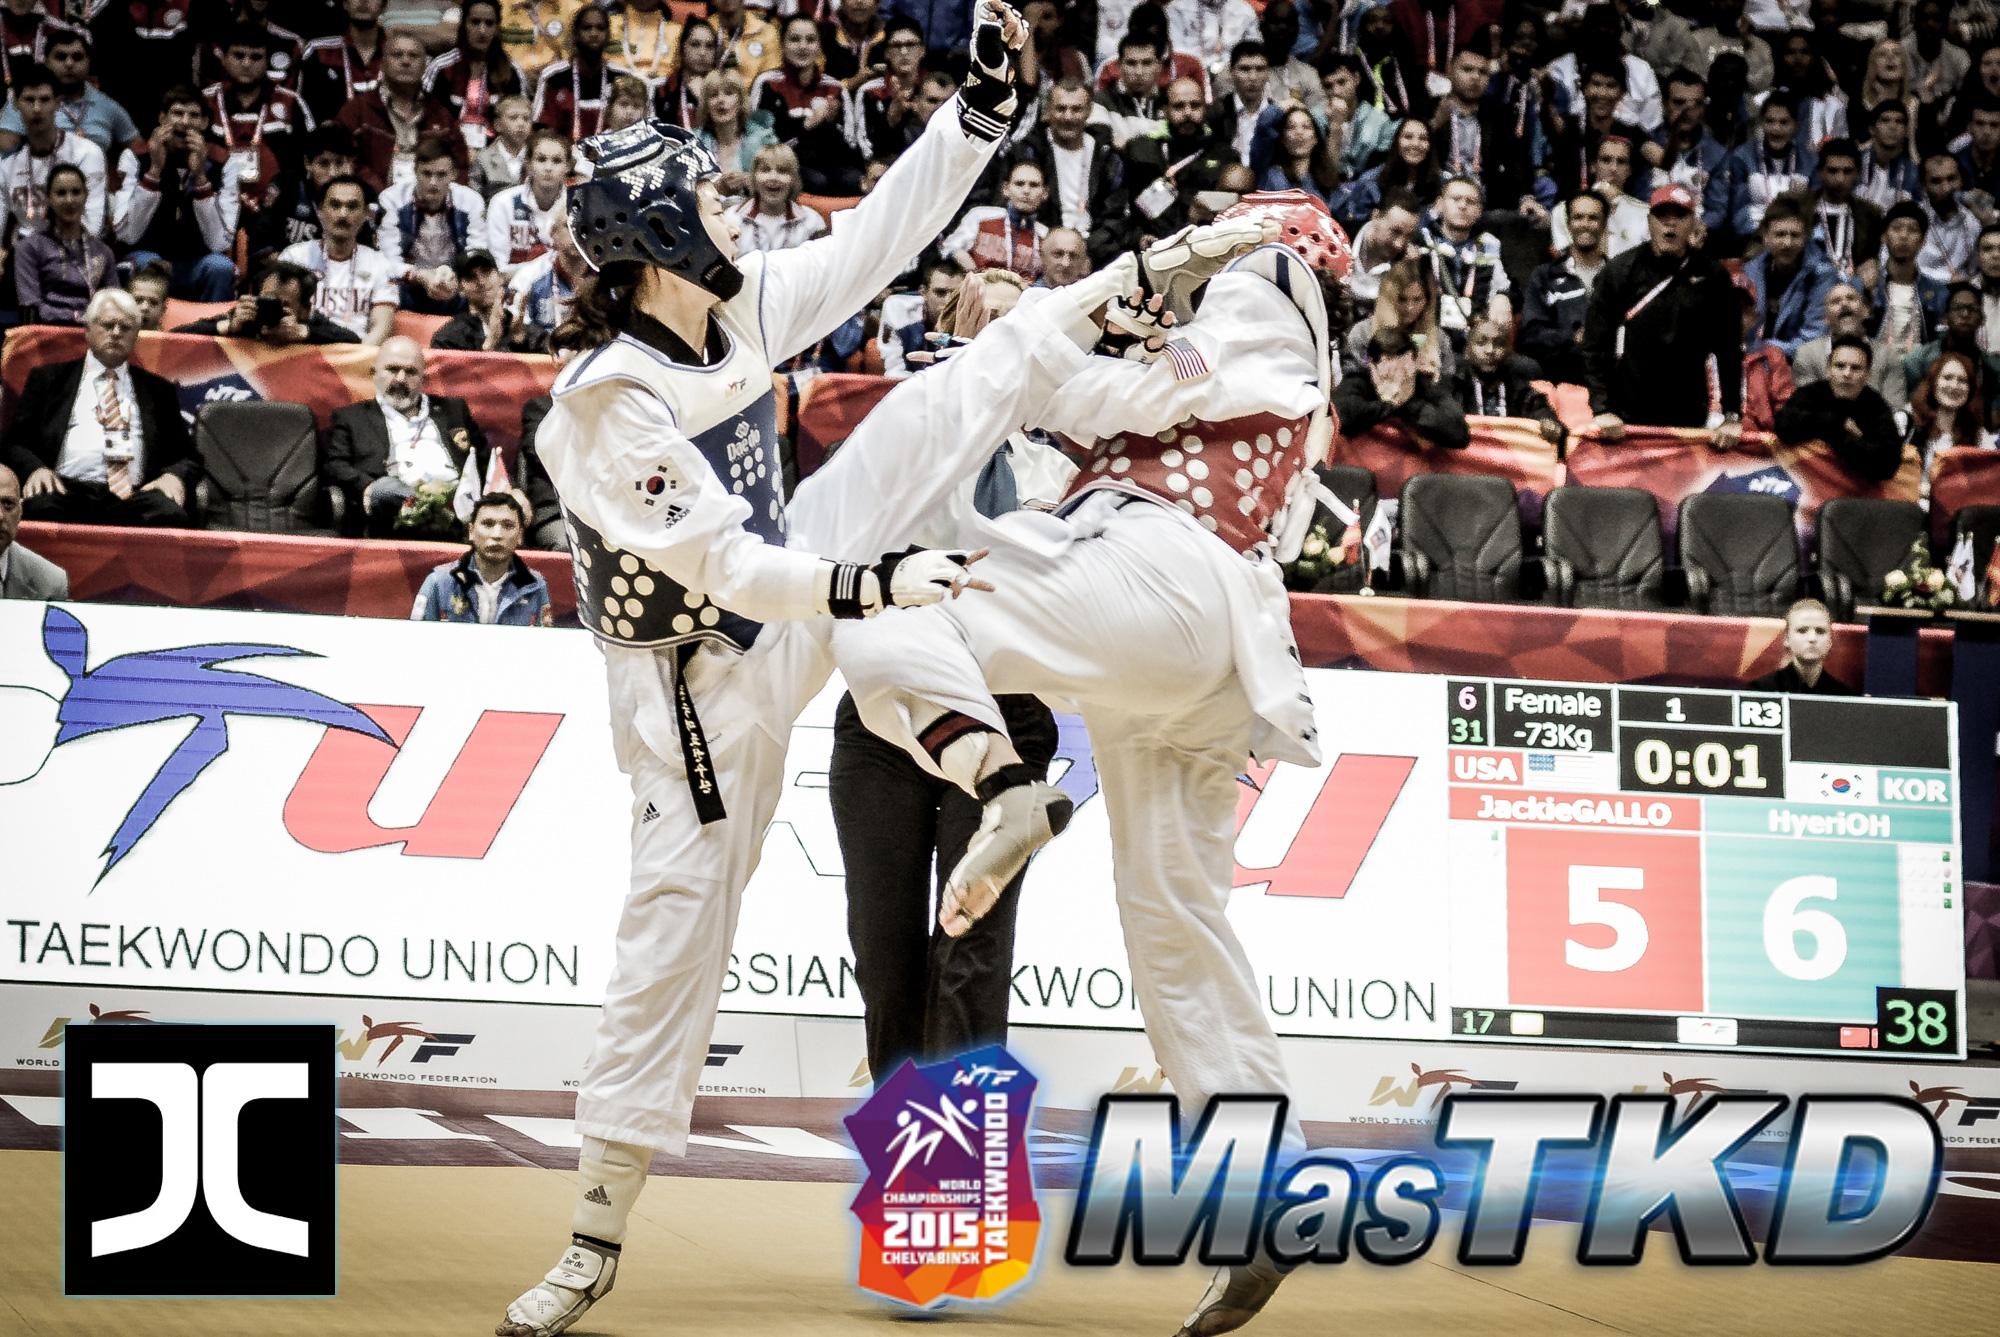 09_Mundial-Taekwondo_JCalicu-Seleccion-Mejor-Foto